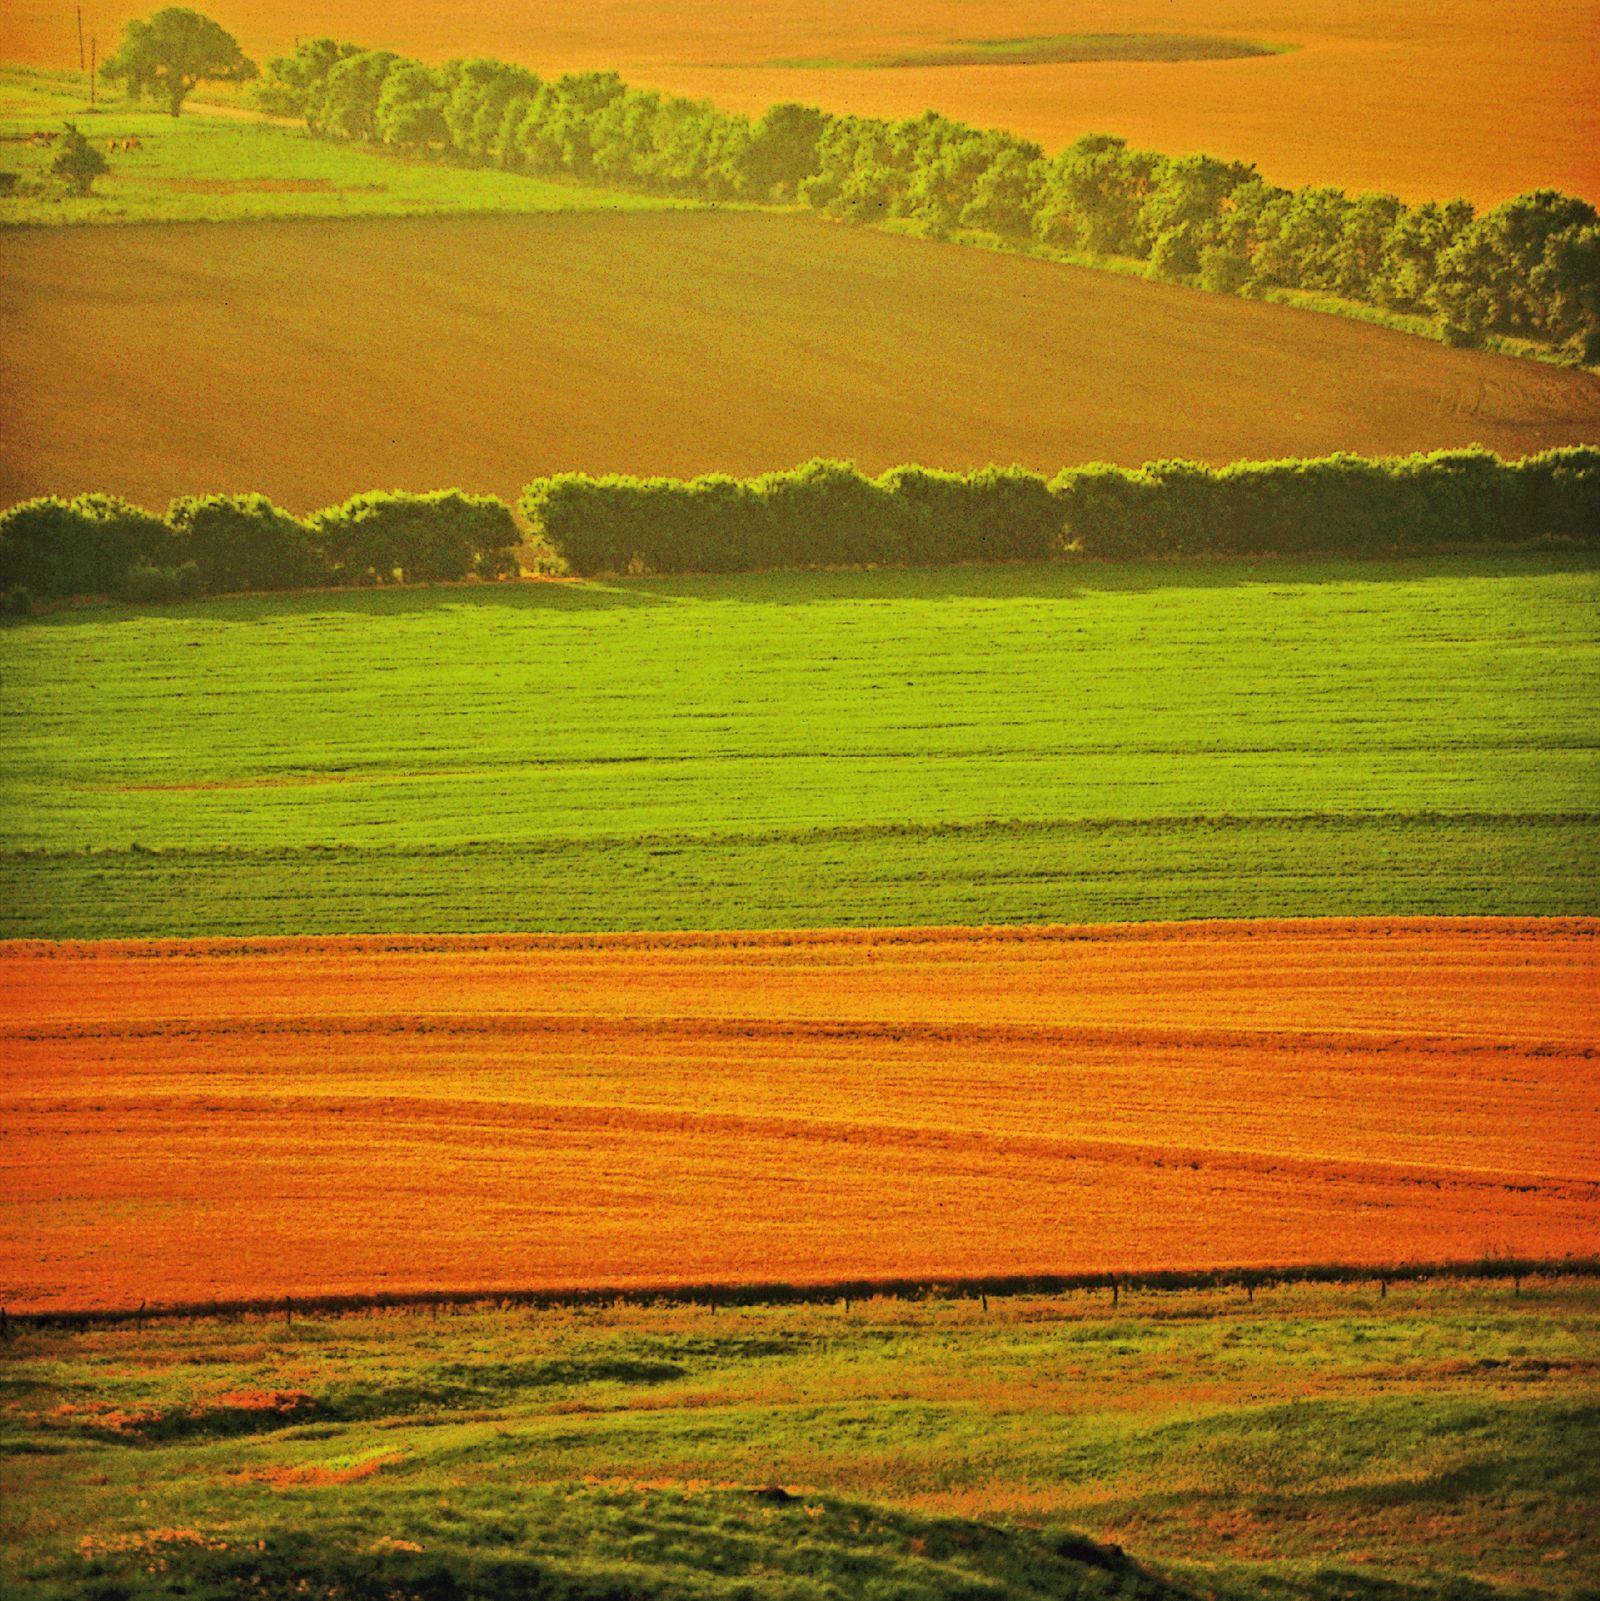 Endloses Farmland